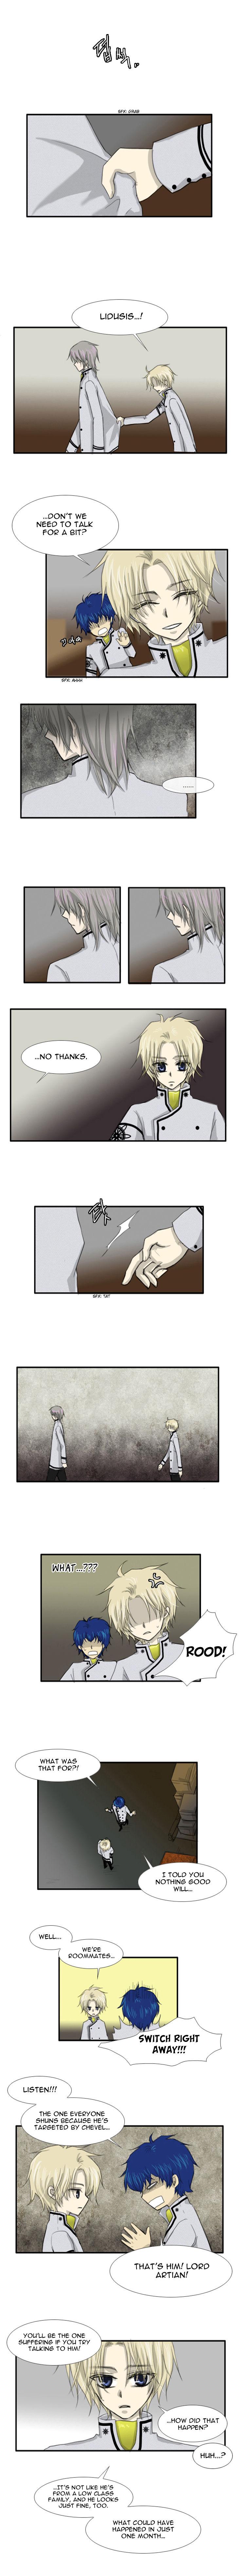 Black Haze 15 Page 2